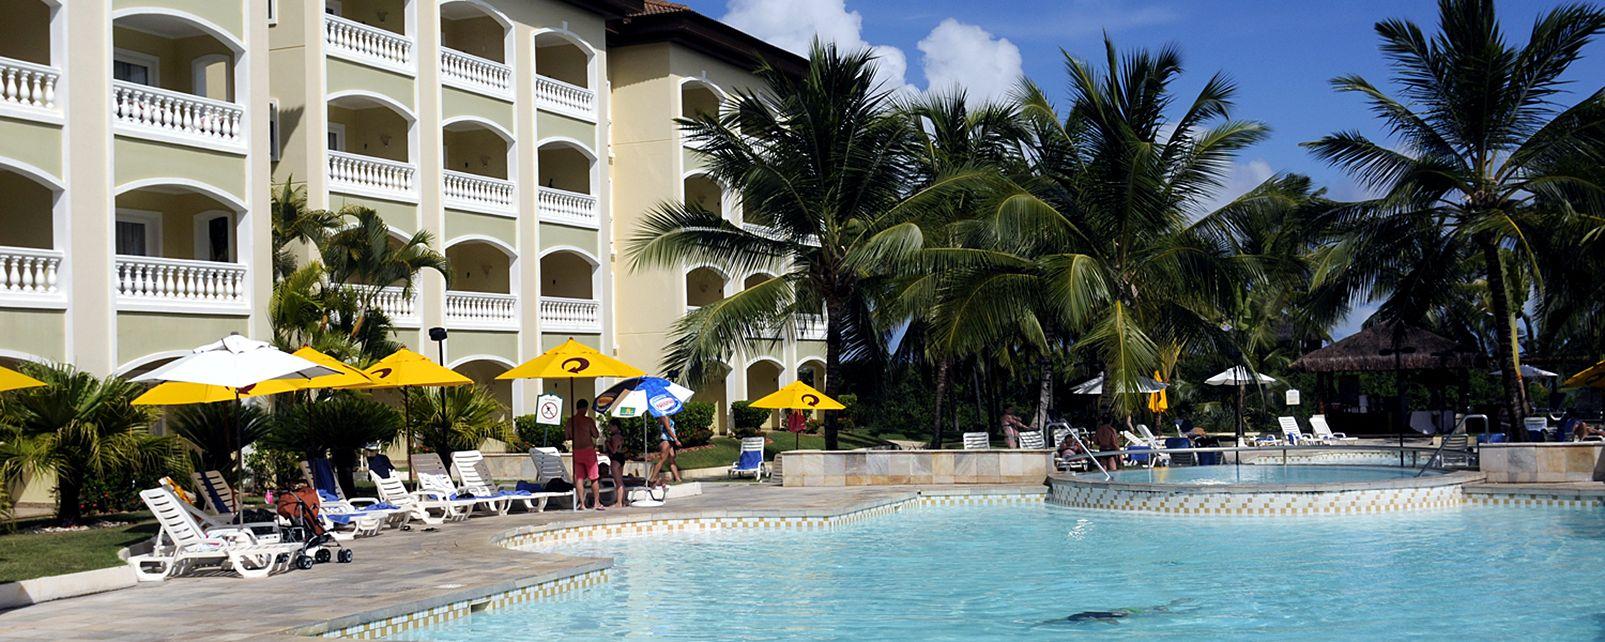 Hotel Costa do Sauipe Class